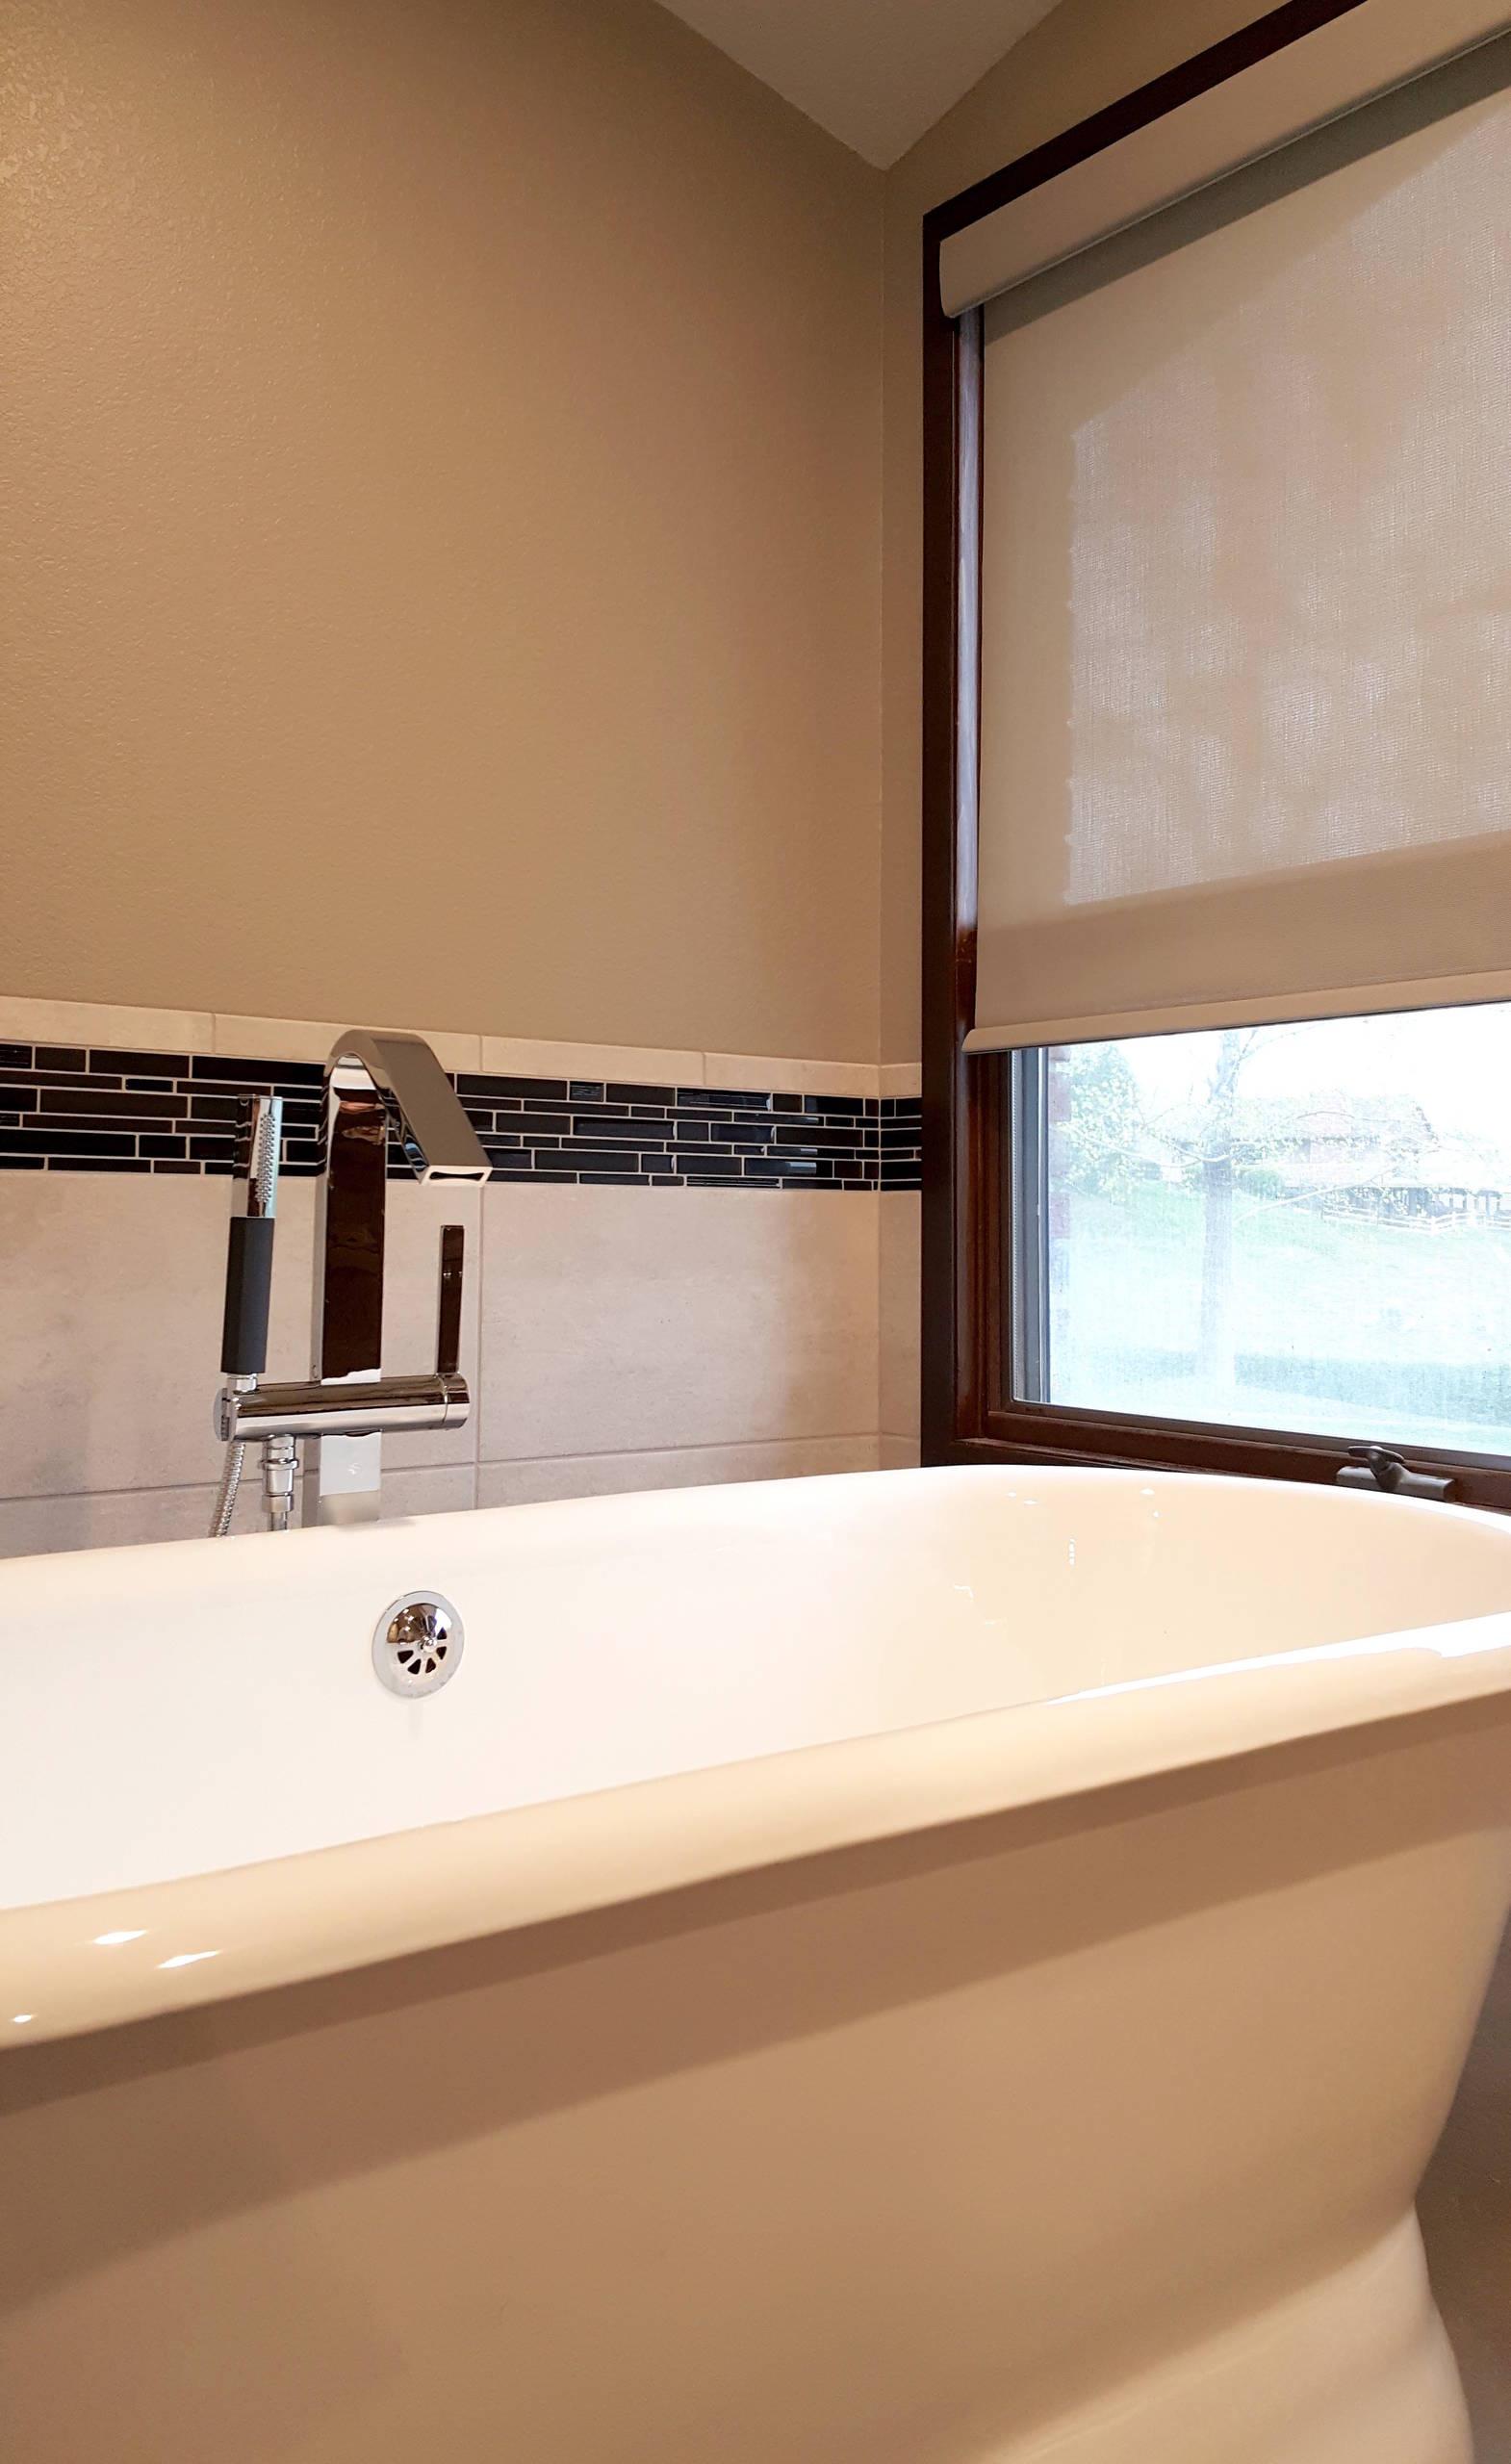 Barnes Bathroom Remodel